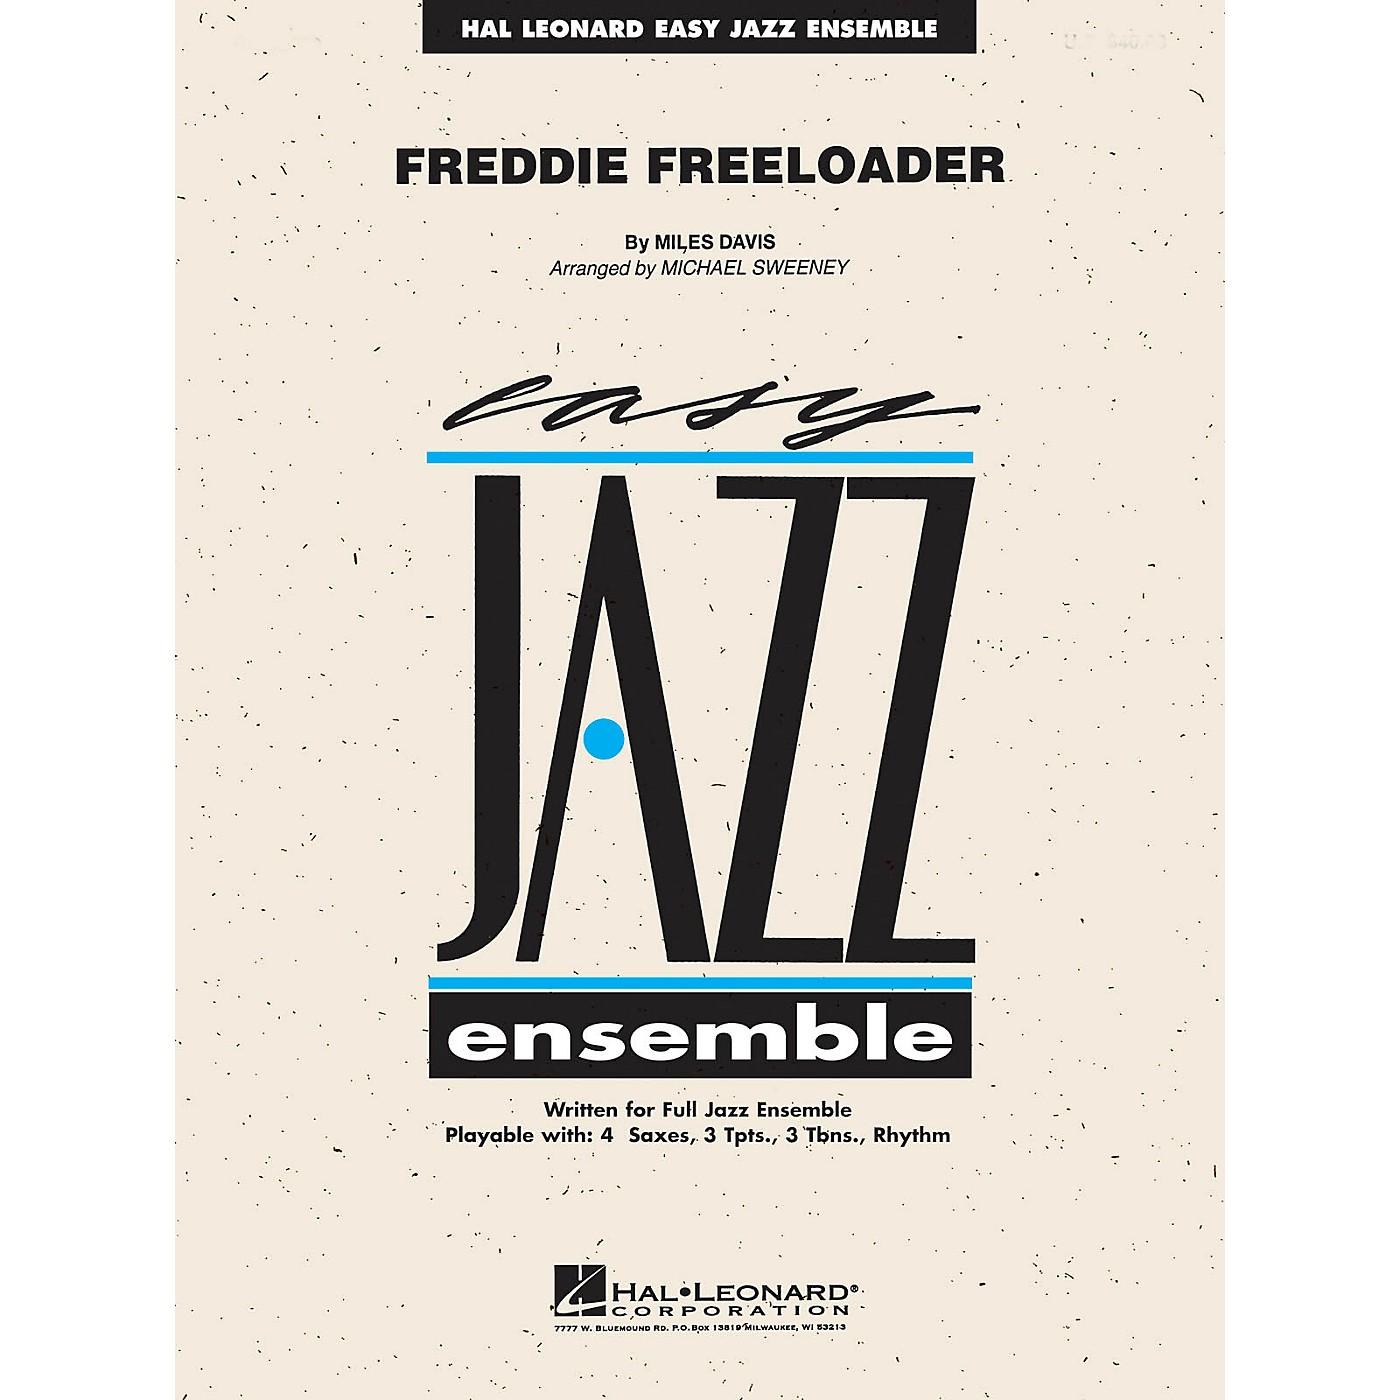 Hal Leonard Freddie Freeloader Jazz Band Level 2 Arranged by Michael Sweeney thumbnail